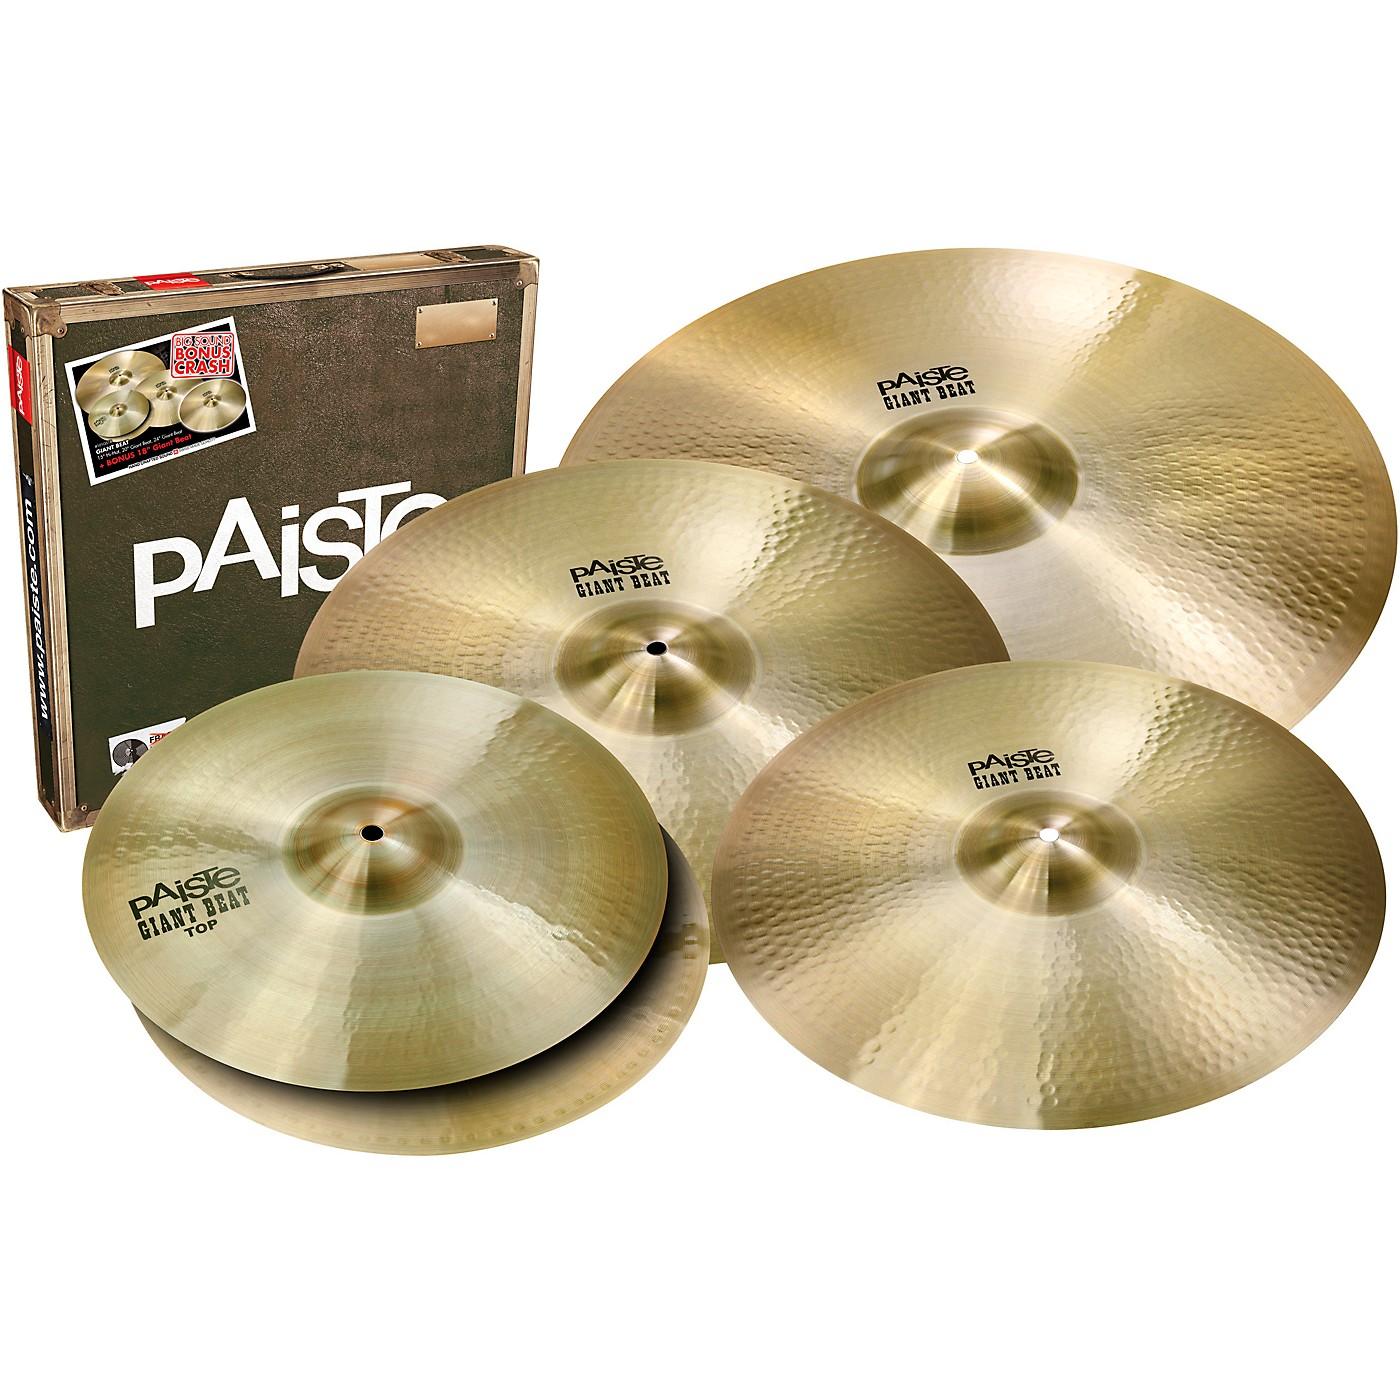 Paiste Giant Beat Big Sound Cymbal Set thumbnail